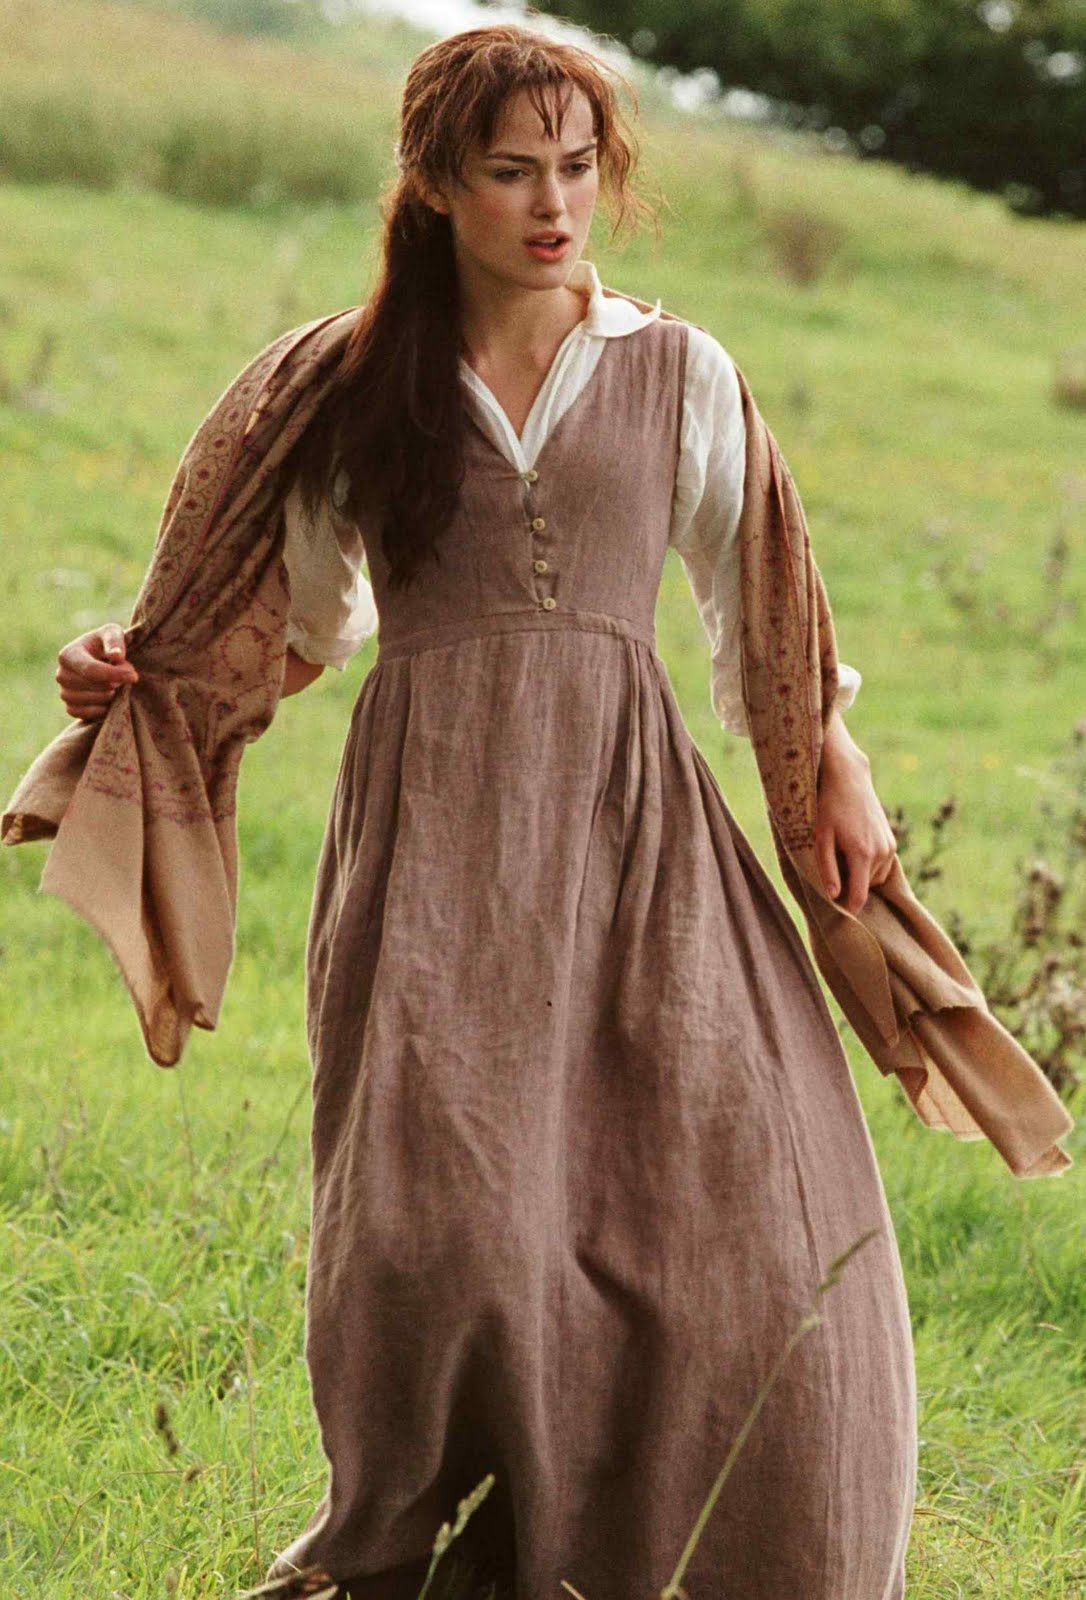 Keira Knightley Cottagecore